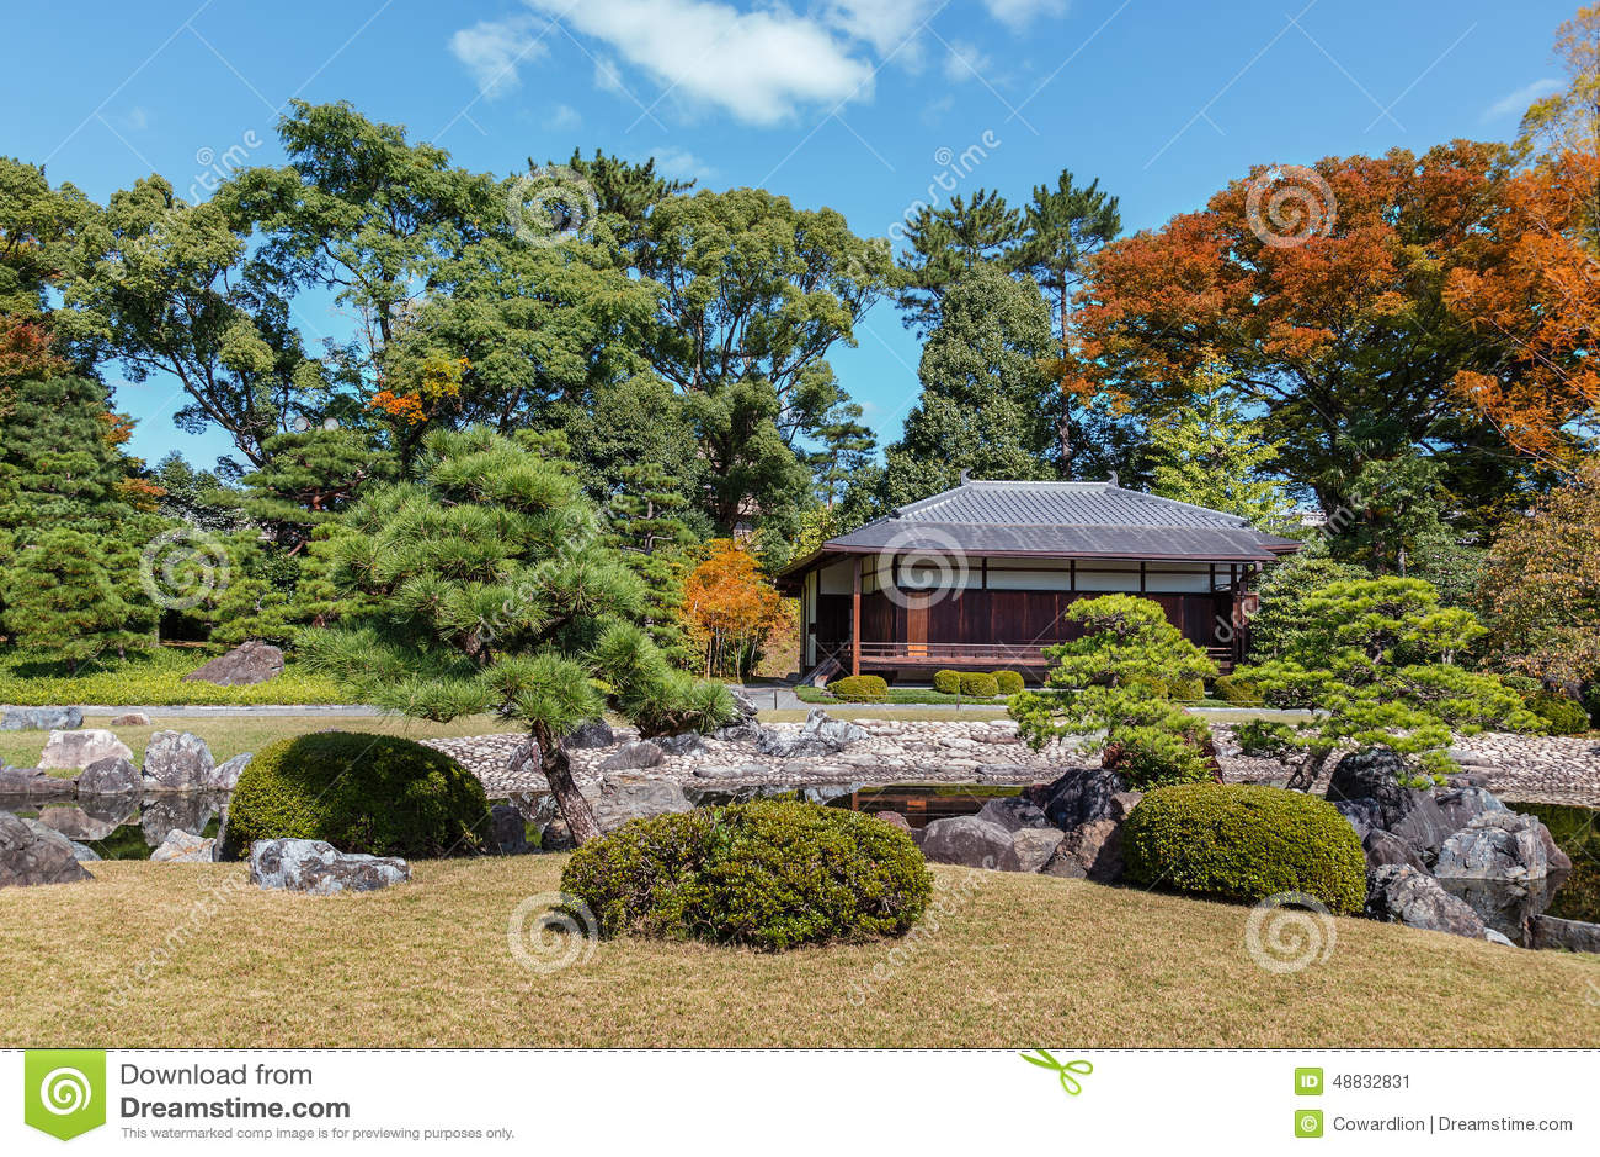 Le Jardin Seiryu-en Et Le Salon De Thé Chez Nijo Se ...